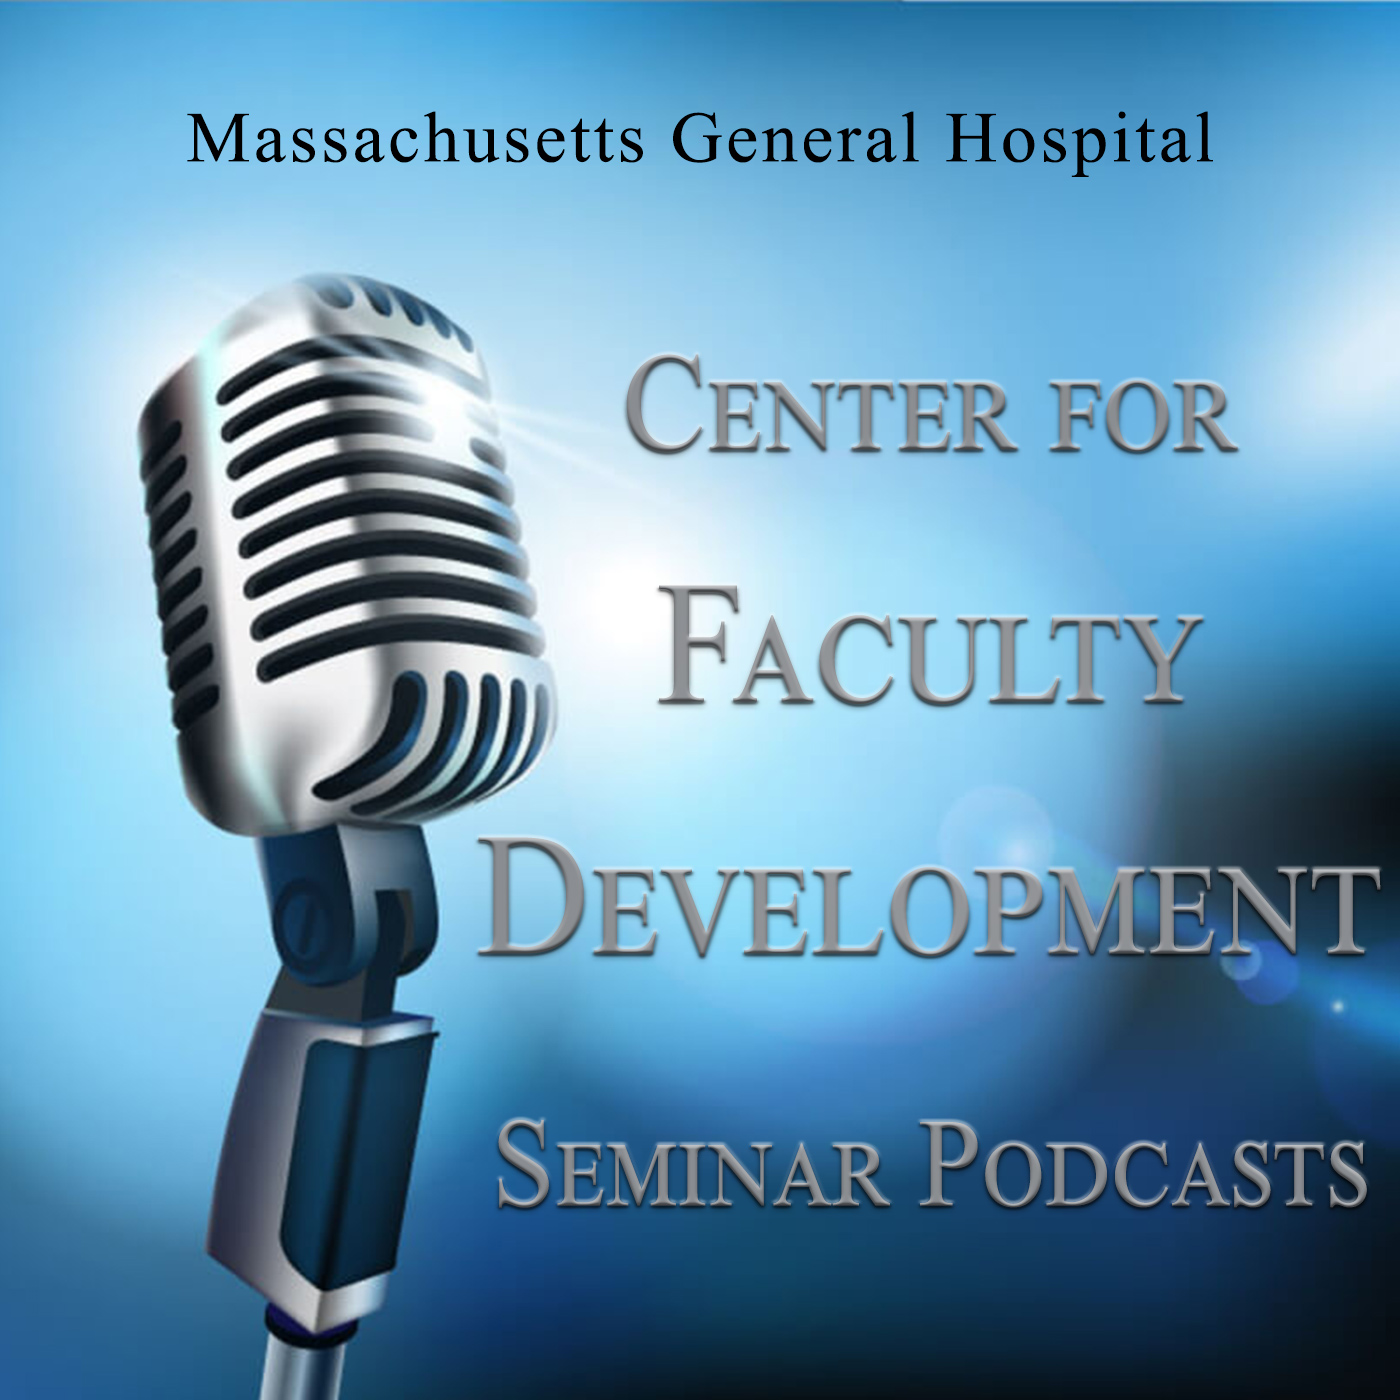 MGH Faculty Development Podcast show art